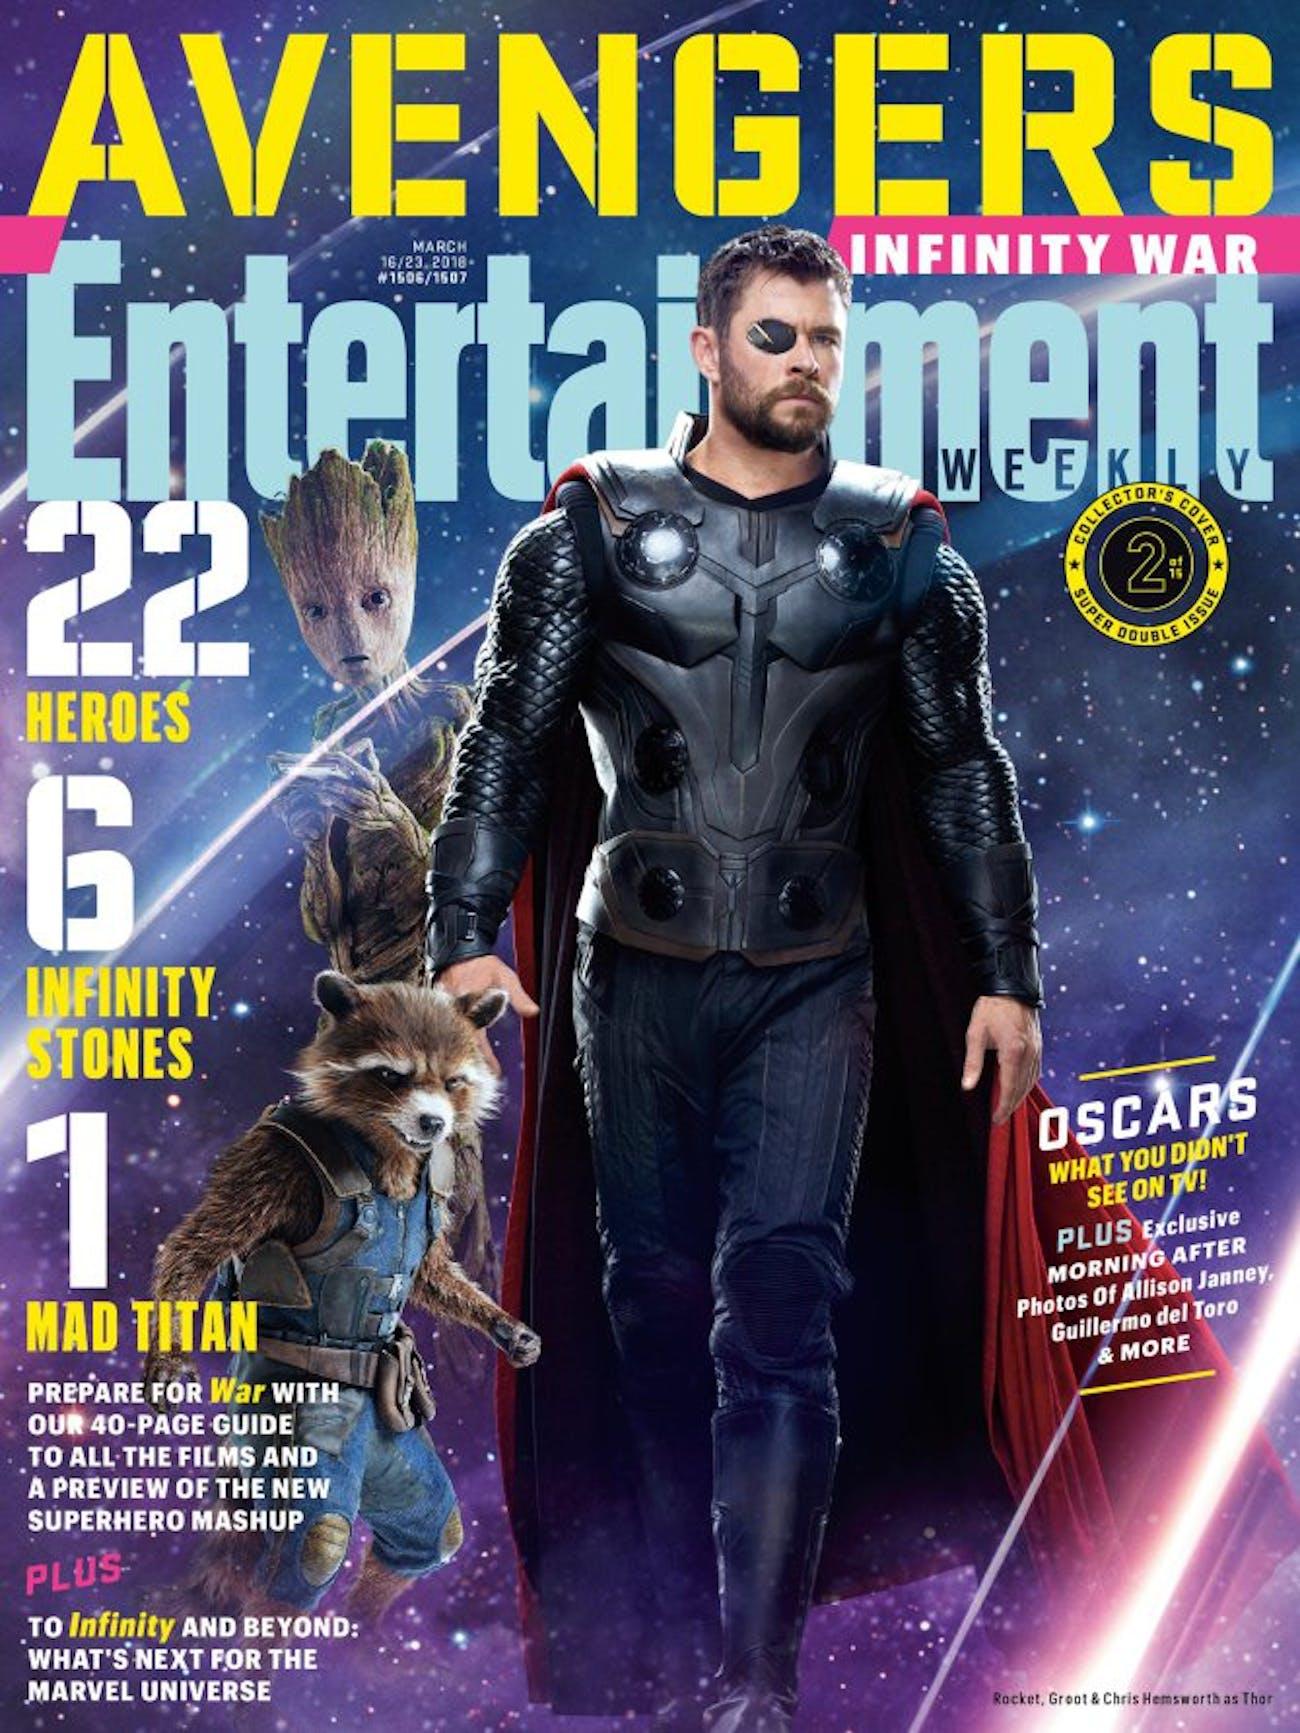 Thor Infinity War Avengers